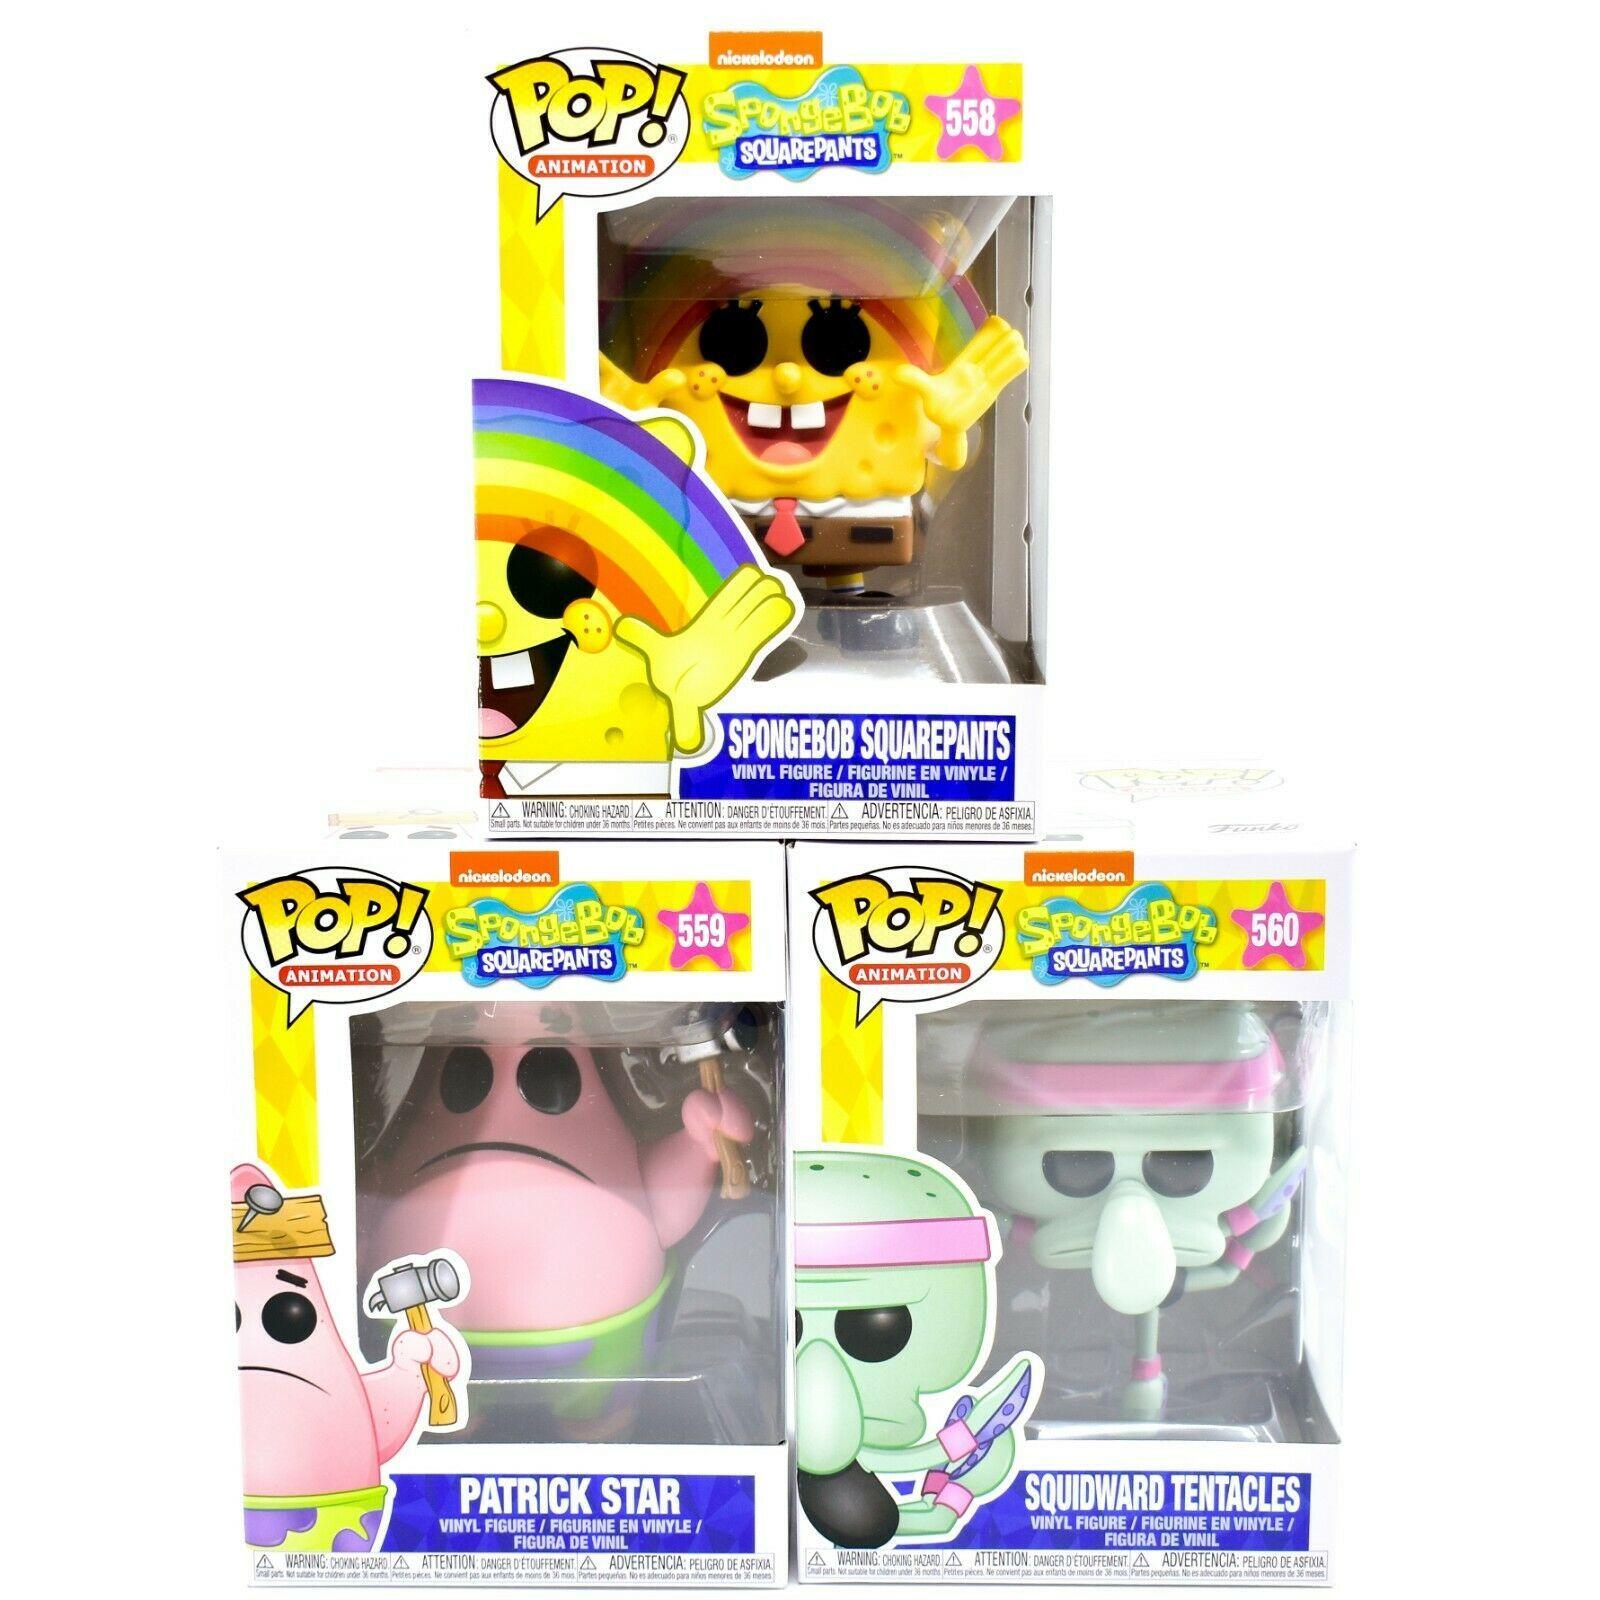 Funko Pop! Complete Set Spongebob Squarepants Patrick Star Squidward Tentacles